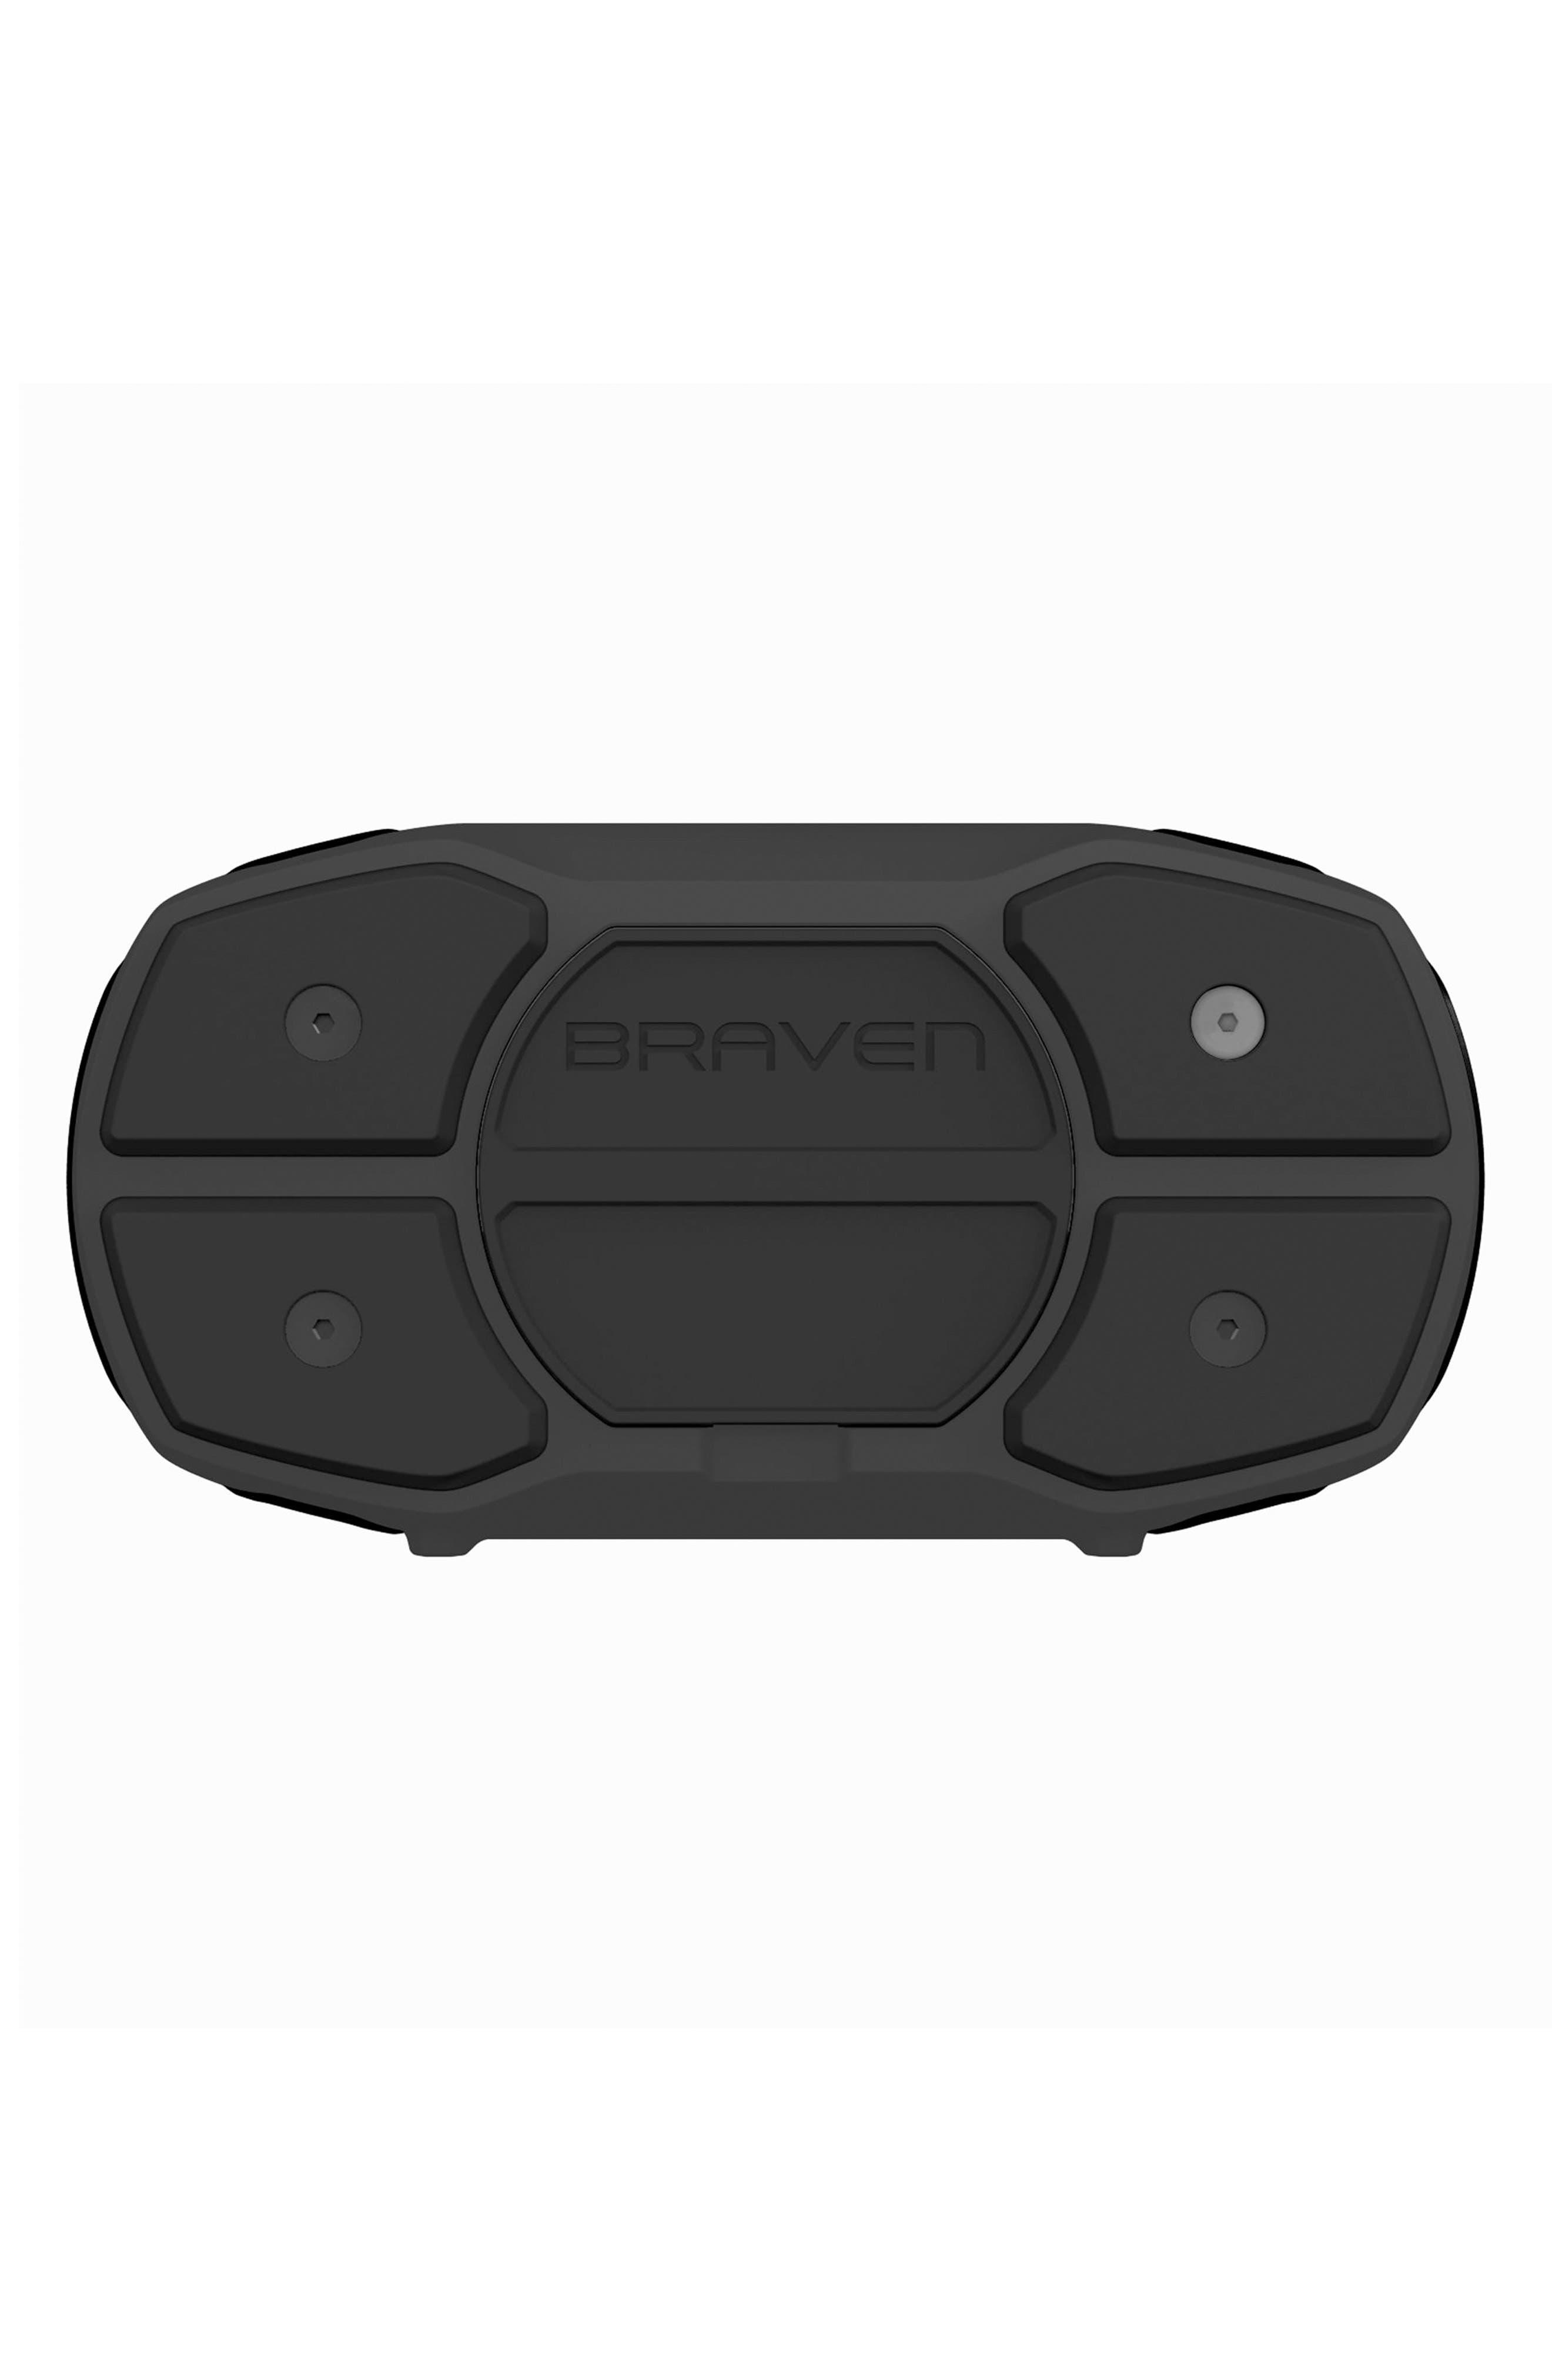 Braven Ready Elite Bluetooth® Speaker